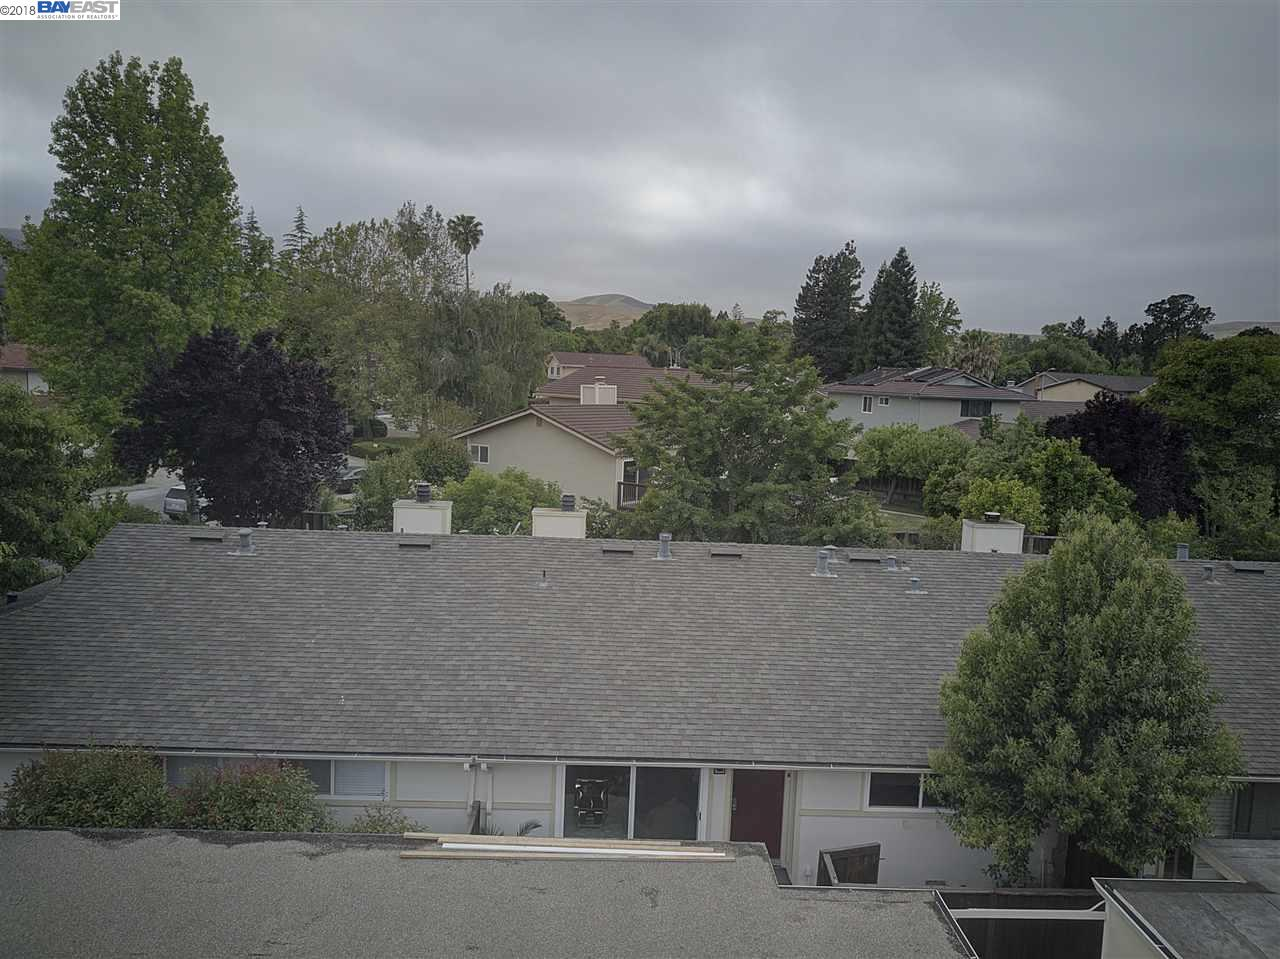 2604 SHADOW MOUNTAIN DR, SAN RAMON, CA 94583  Photo